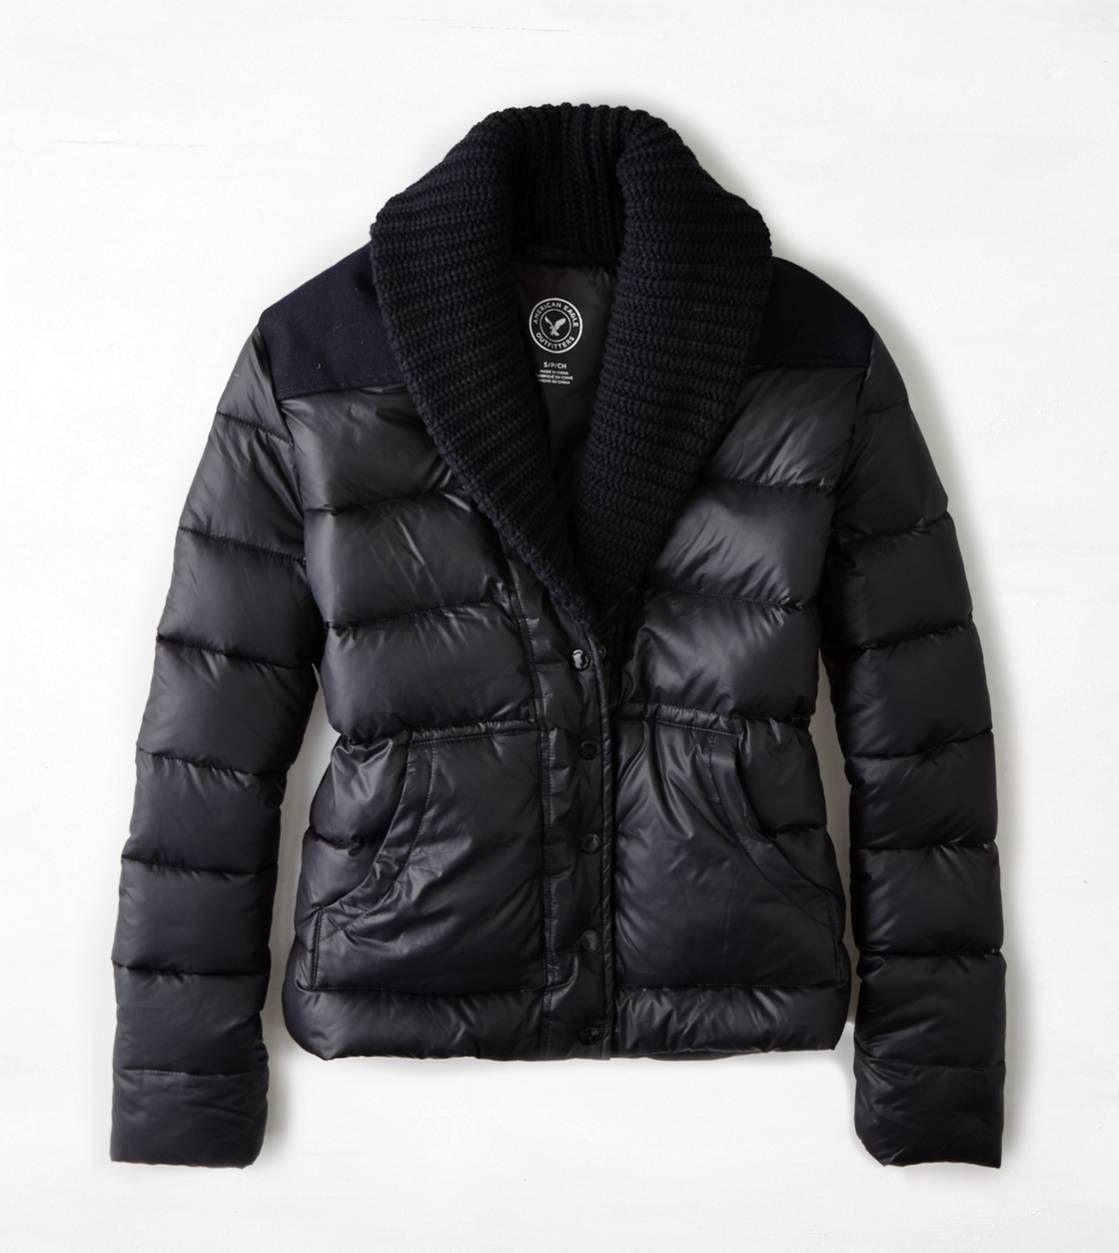 Aeo Shawl Collar Puffer Jacket Jackets Jackets For Women Casual Coat [ 1253 x 1119 Pixel ]